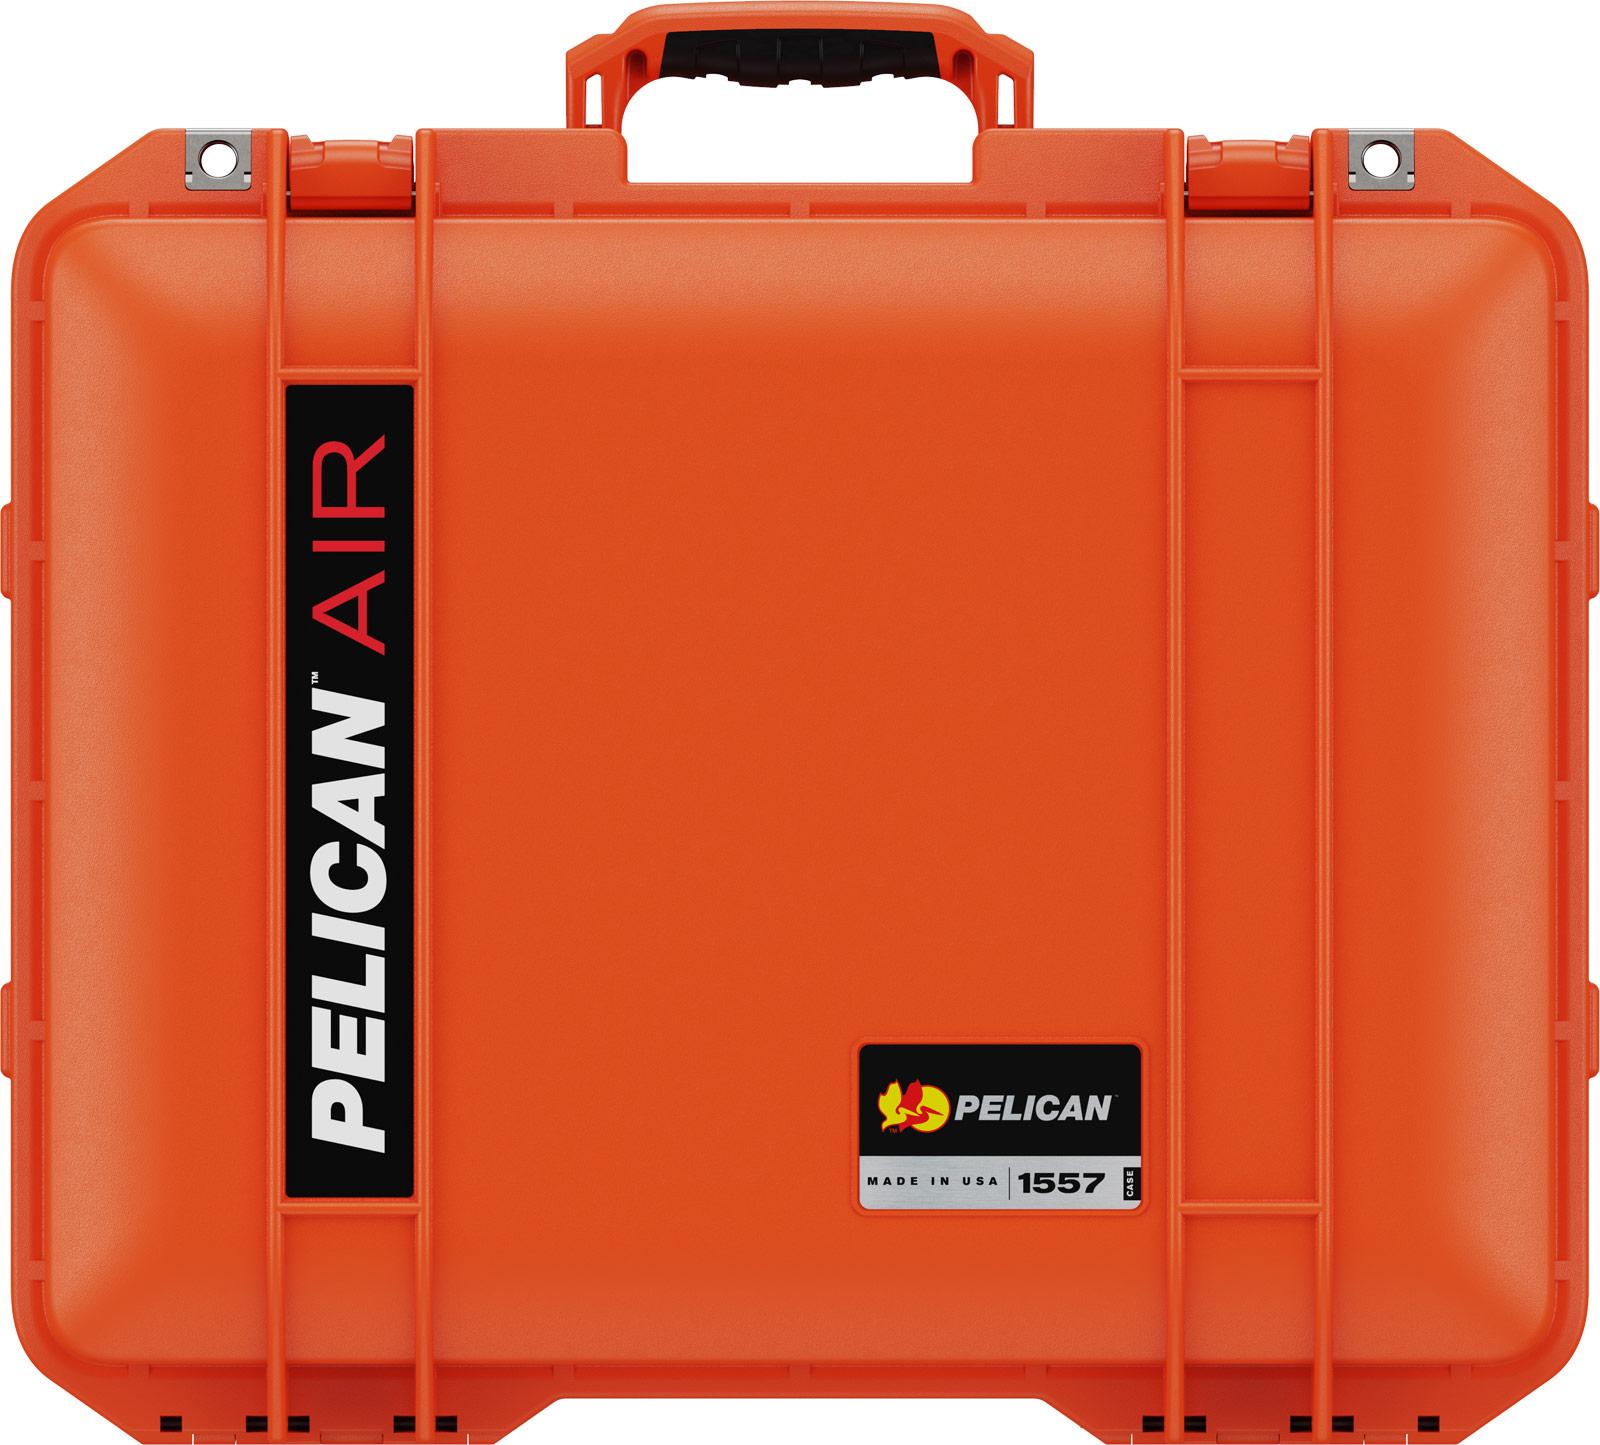 pelican deep orange 1557 air case